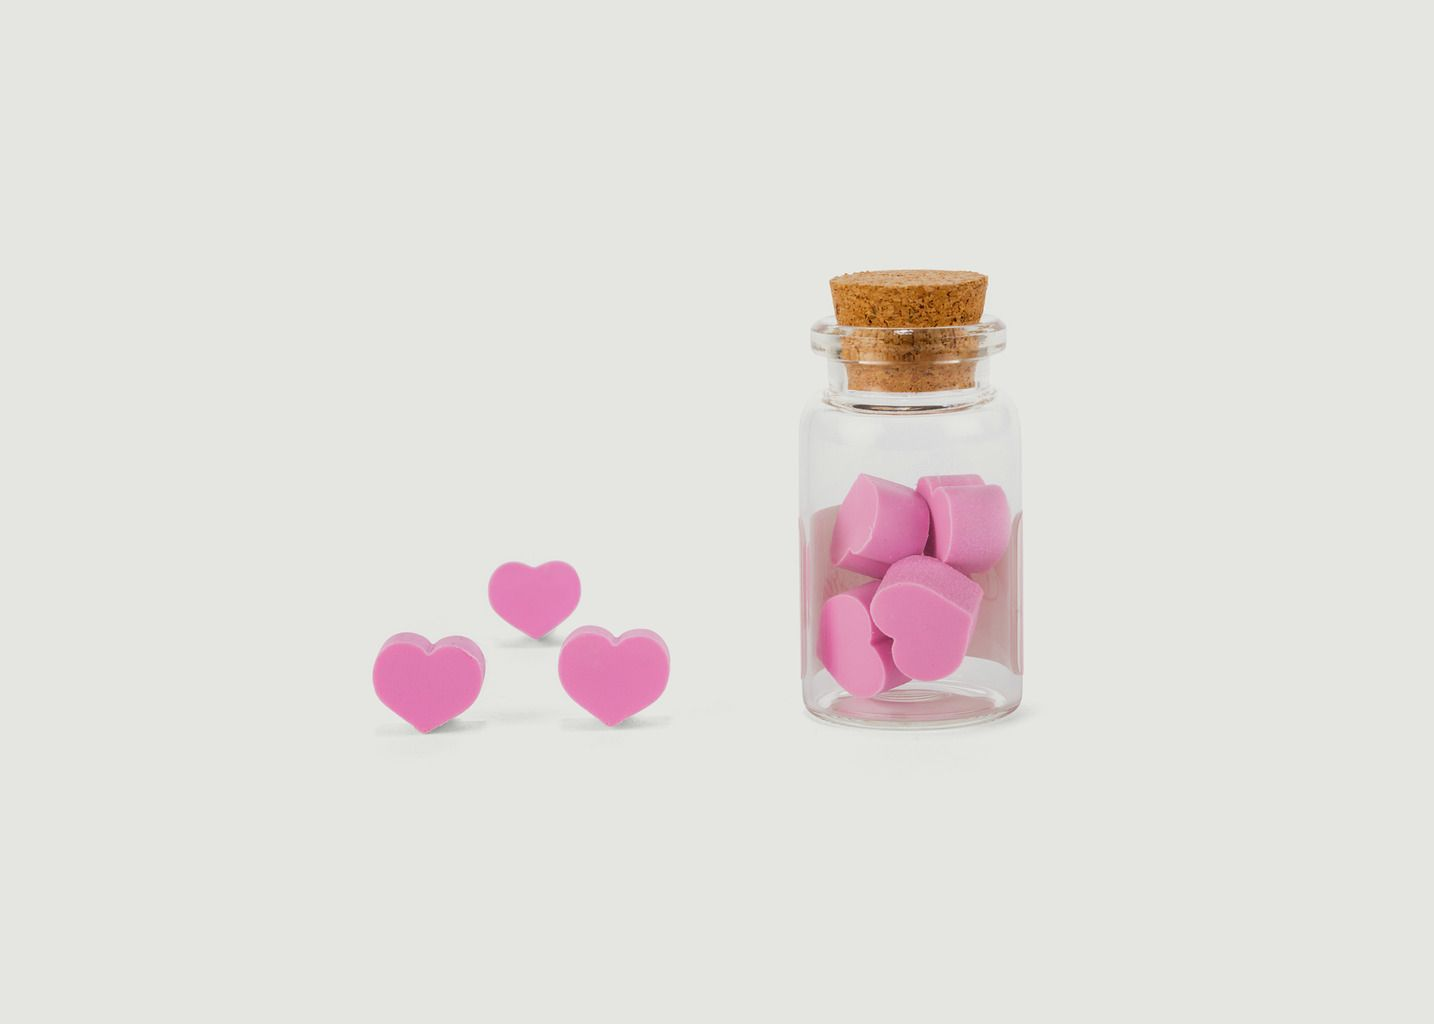 Set de 8 Gommes Cœurs Parfumées 'Rose' - Kikkerland